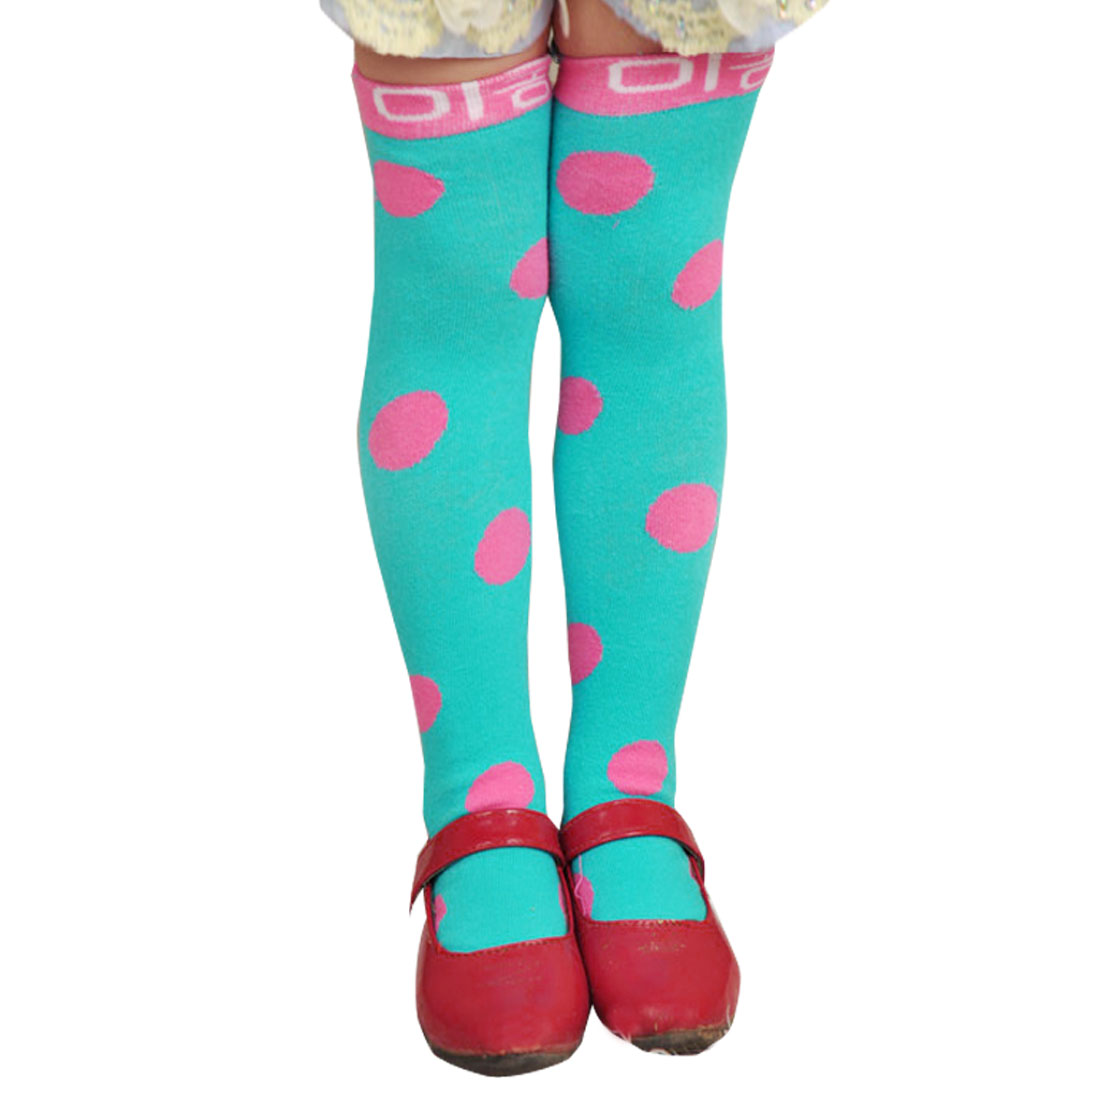 Polka Dots Pattern Footwear Princess Sockings Teal Green for 2-8Y Child Girls